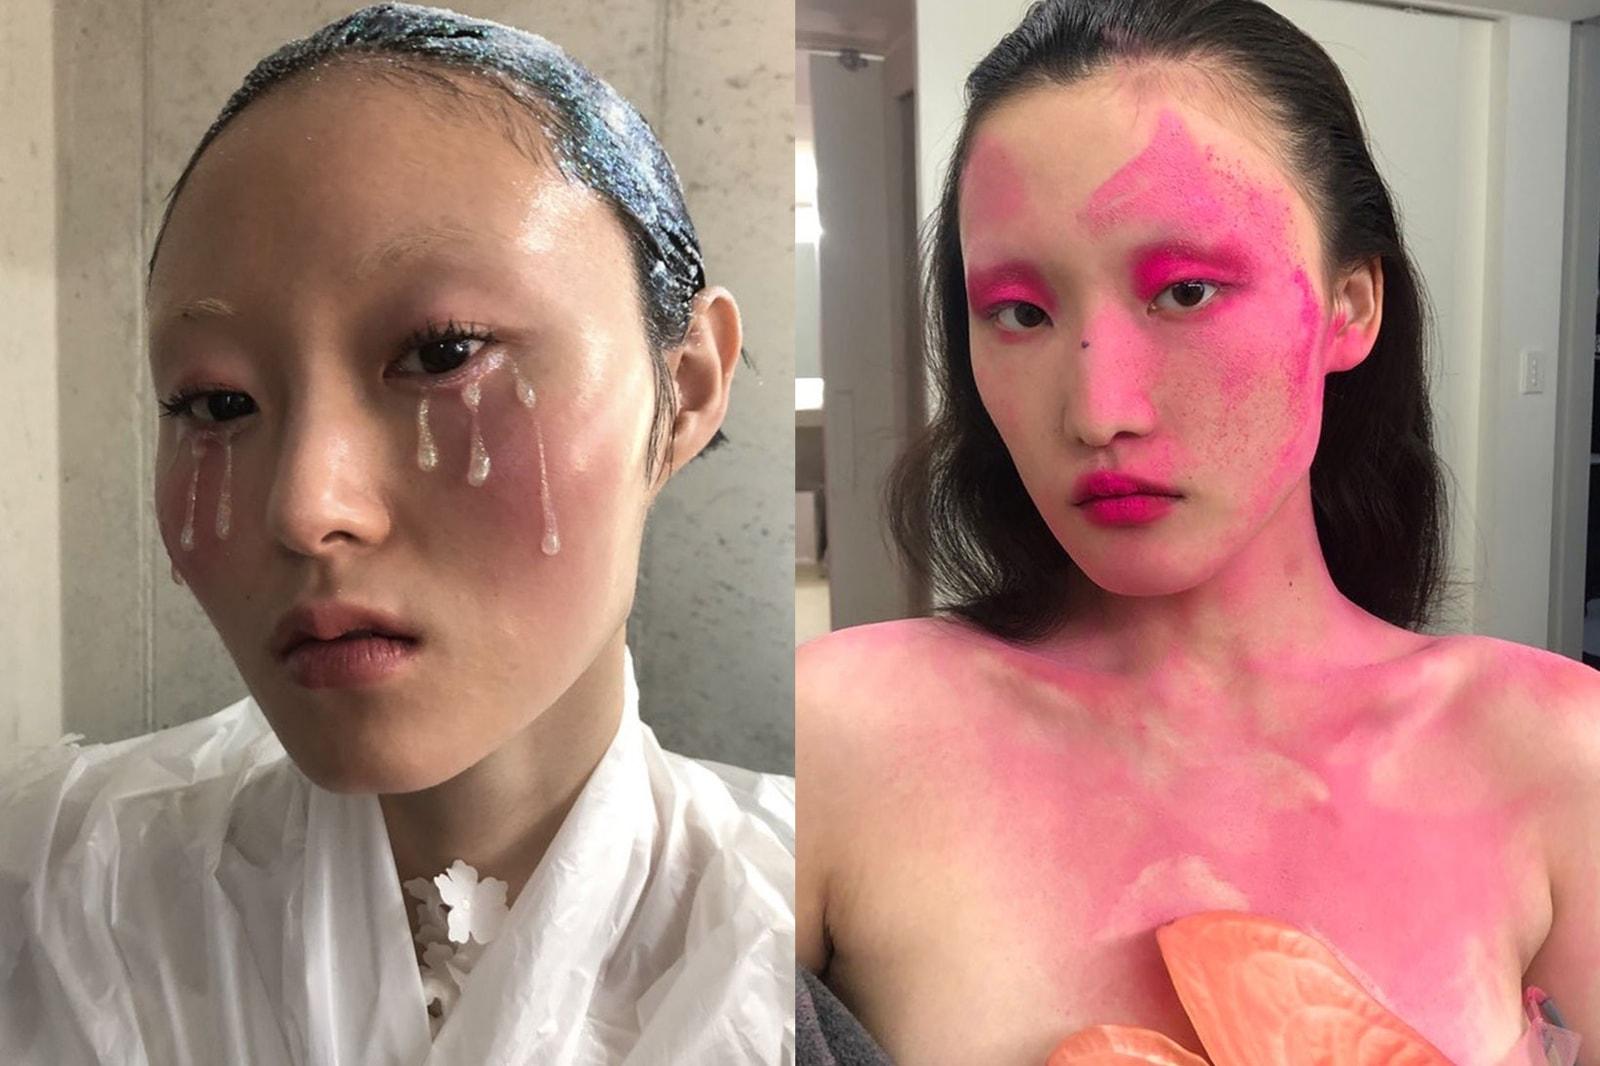 k-beauty makeup artist joynara won joyeon yoonyoung bae hoyeon jung beauty models fashion photoshoot